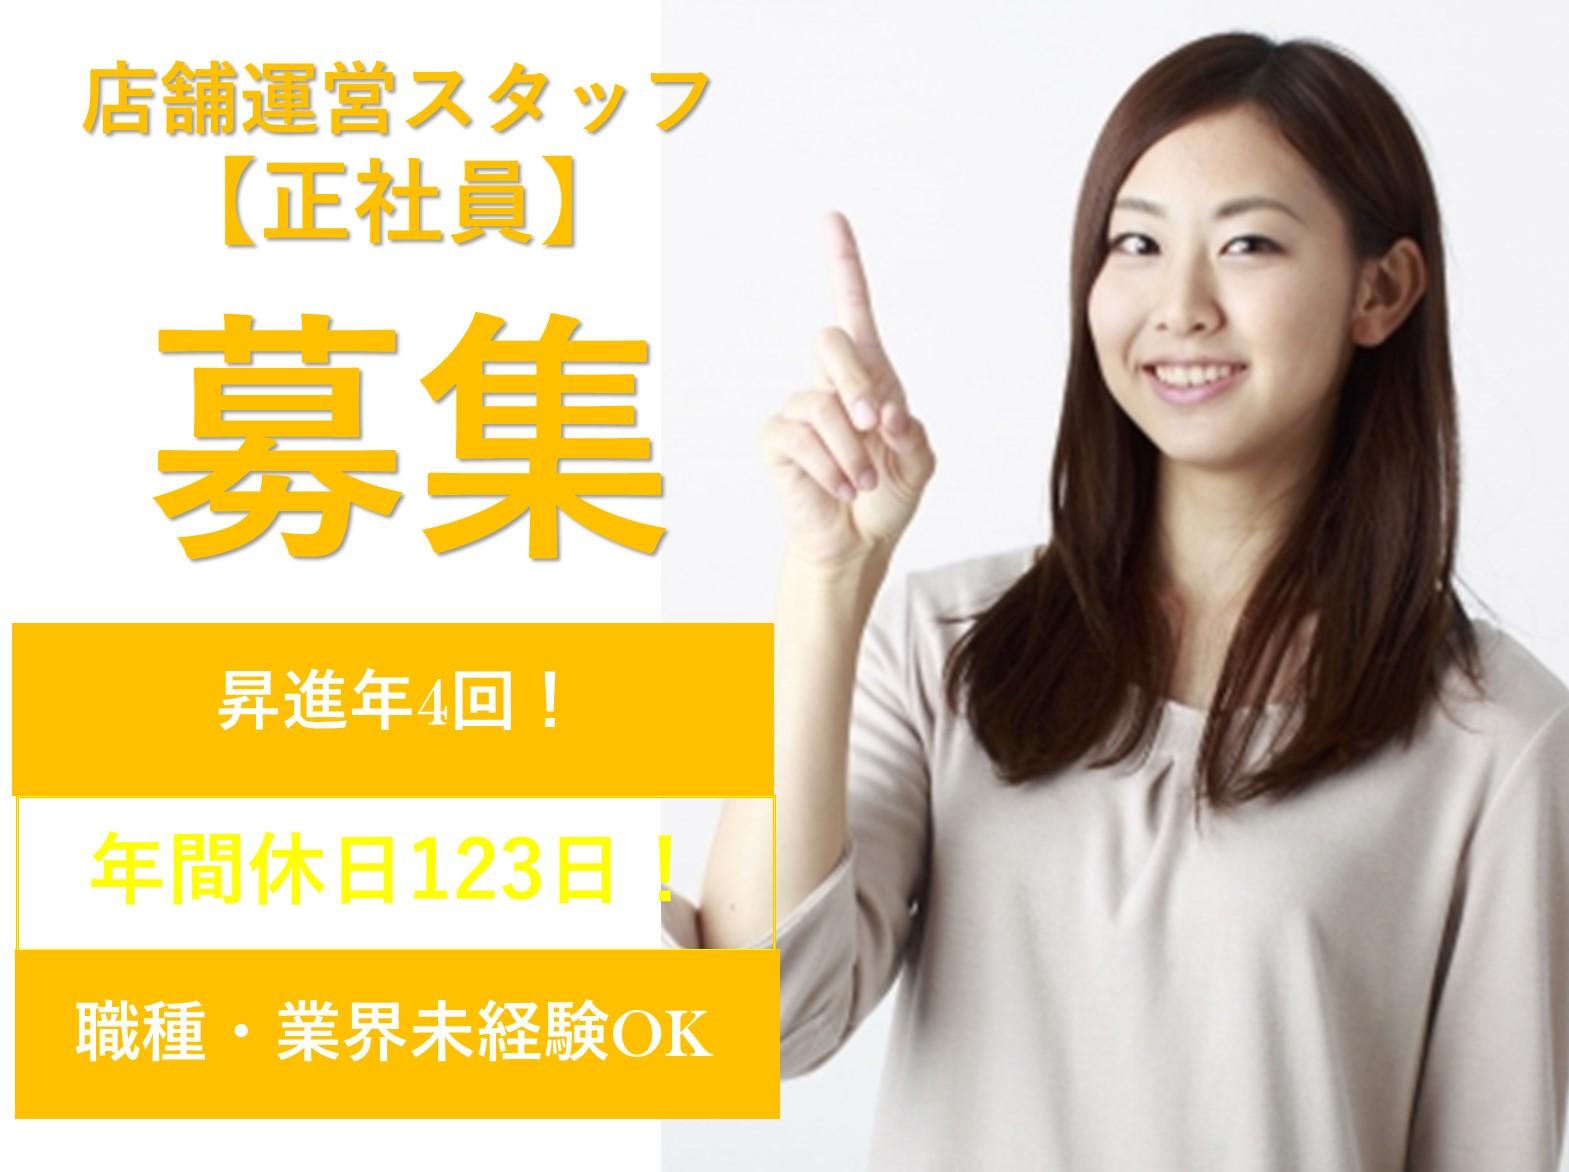 即面談可能【正社員】昇進年4回!年間休日123日!牛丼屋店舗運営スタッフ イメージ